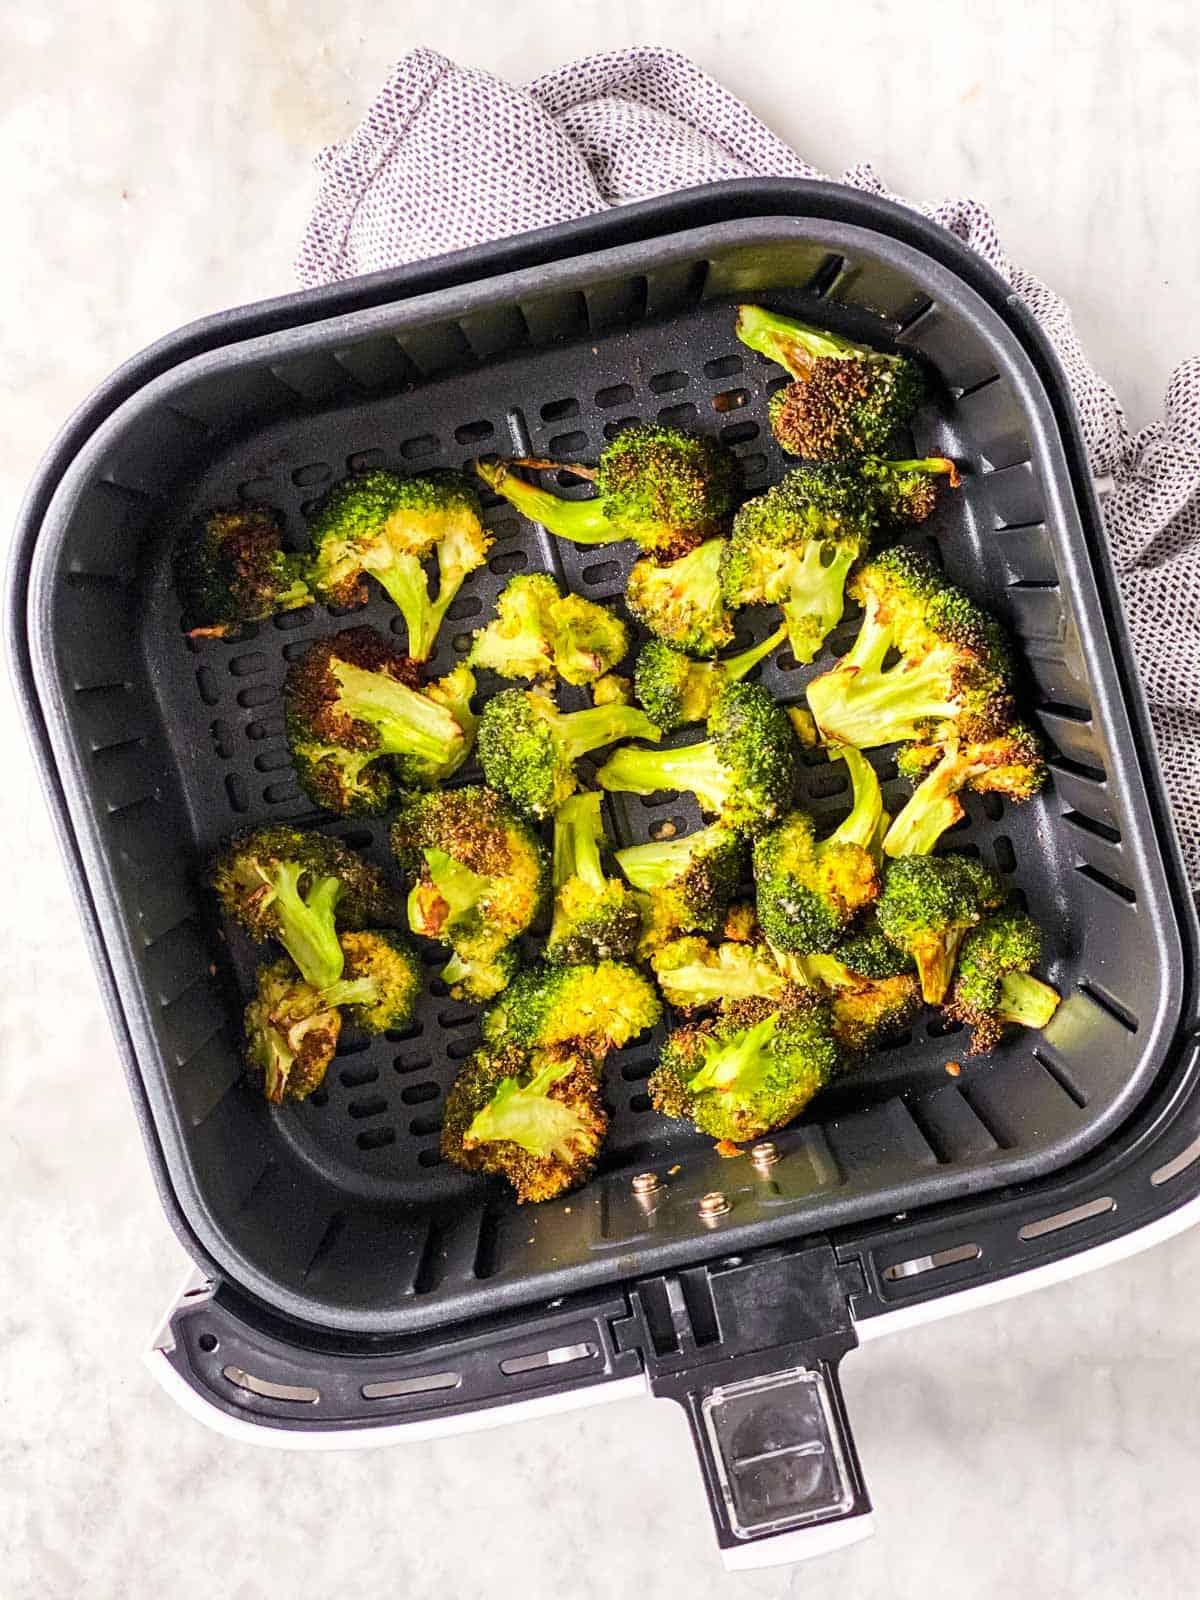 air fryer basket with roasted broccoli florets inside